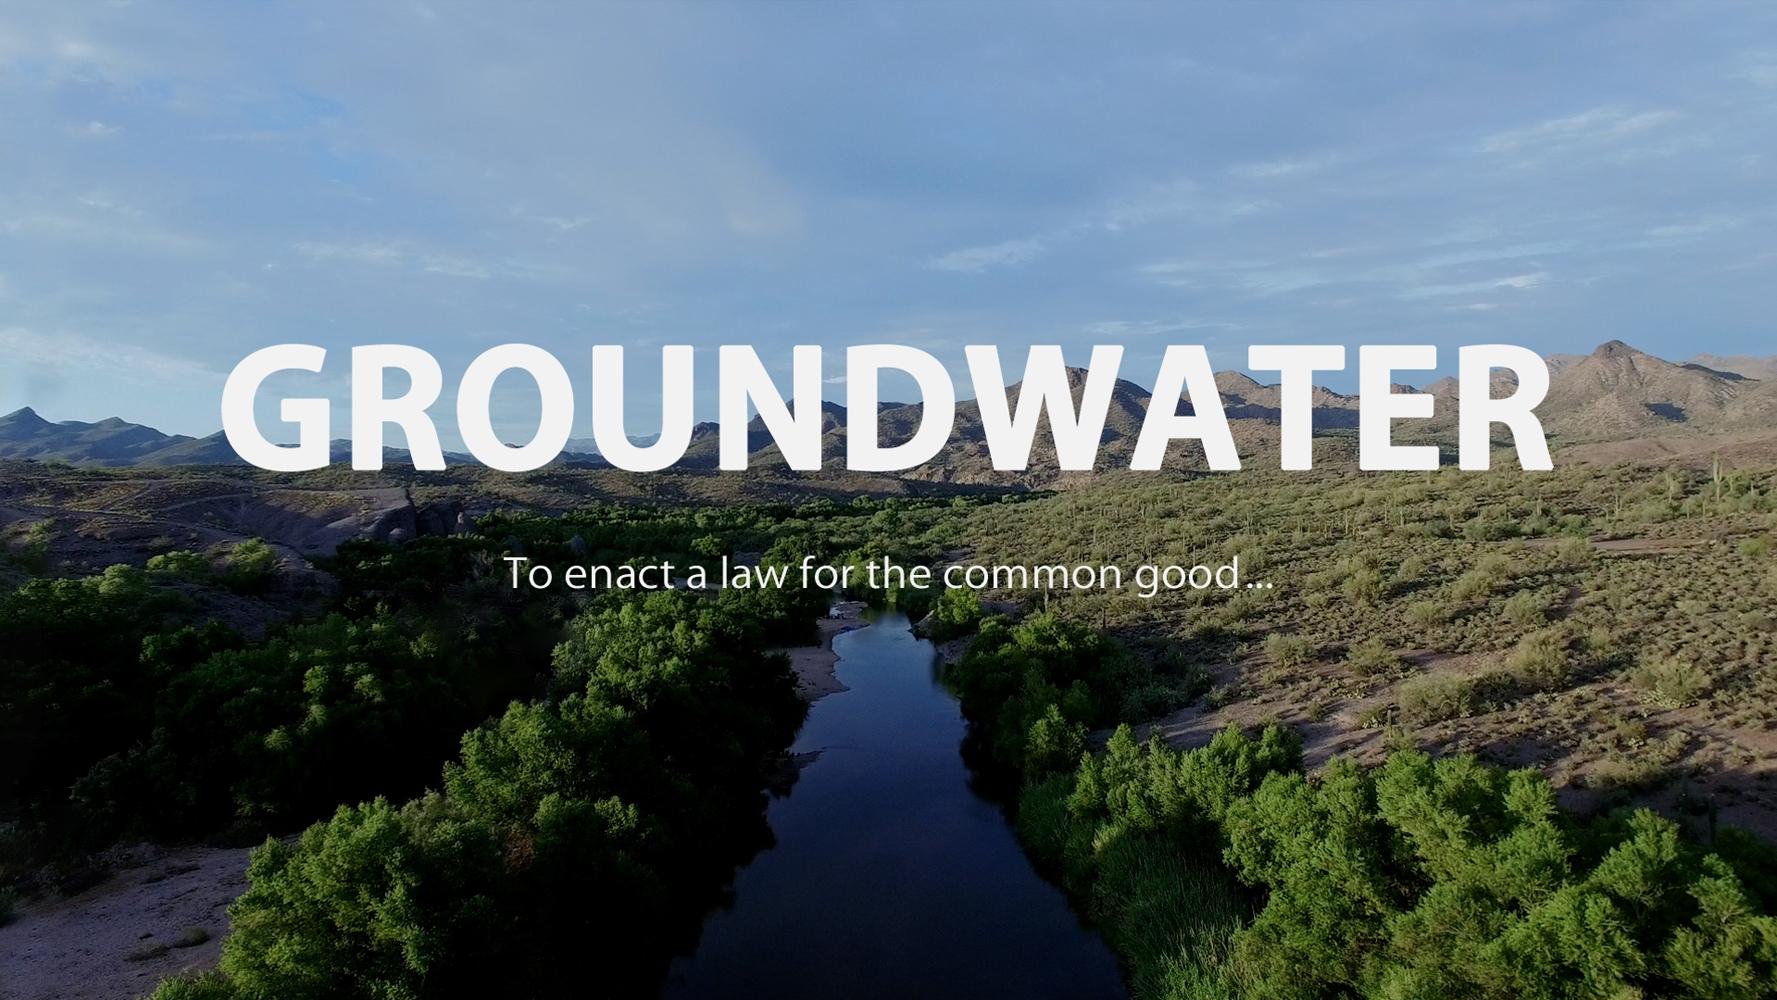 Groundwater Poster.jpg